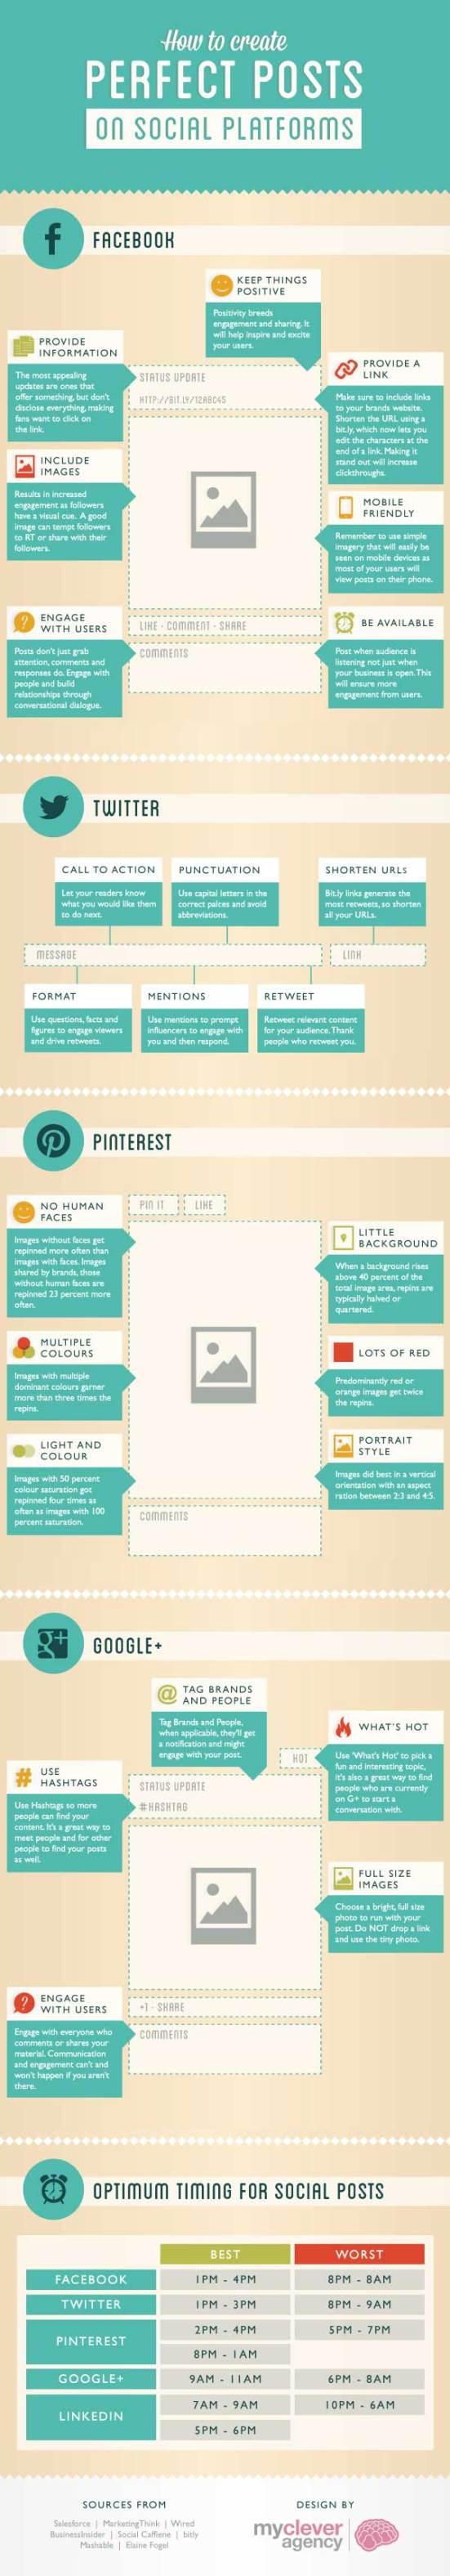 status updates, social media, facebook, google +, Twitter, LinkedIn, Pinterest